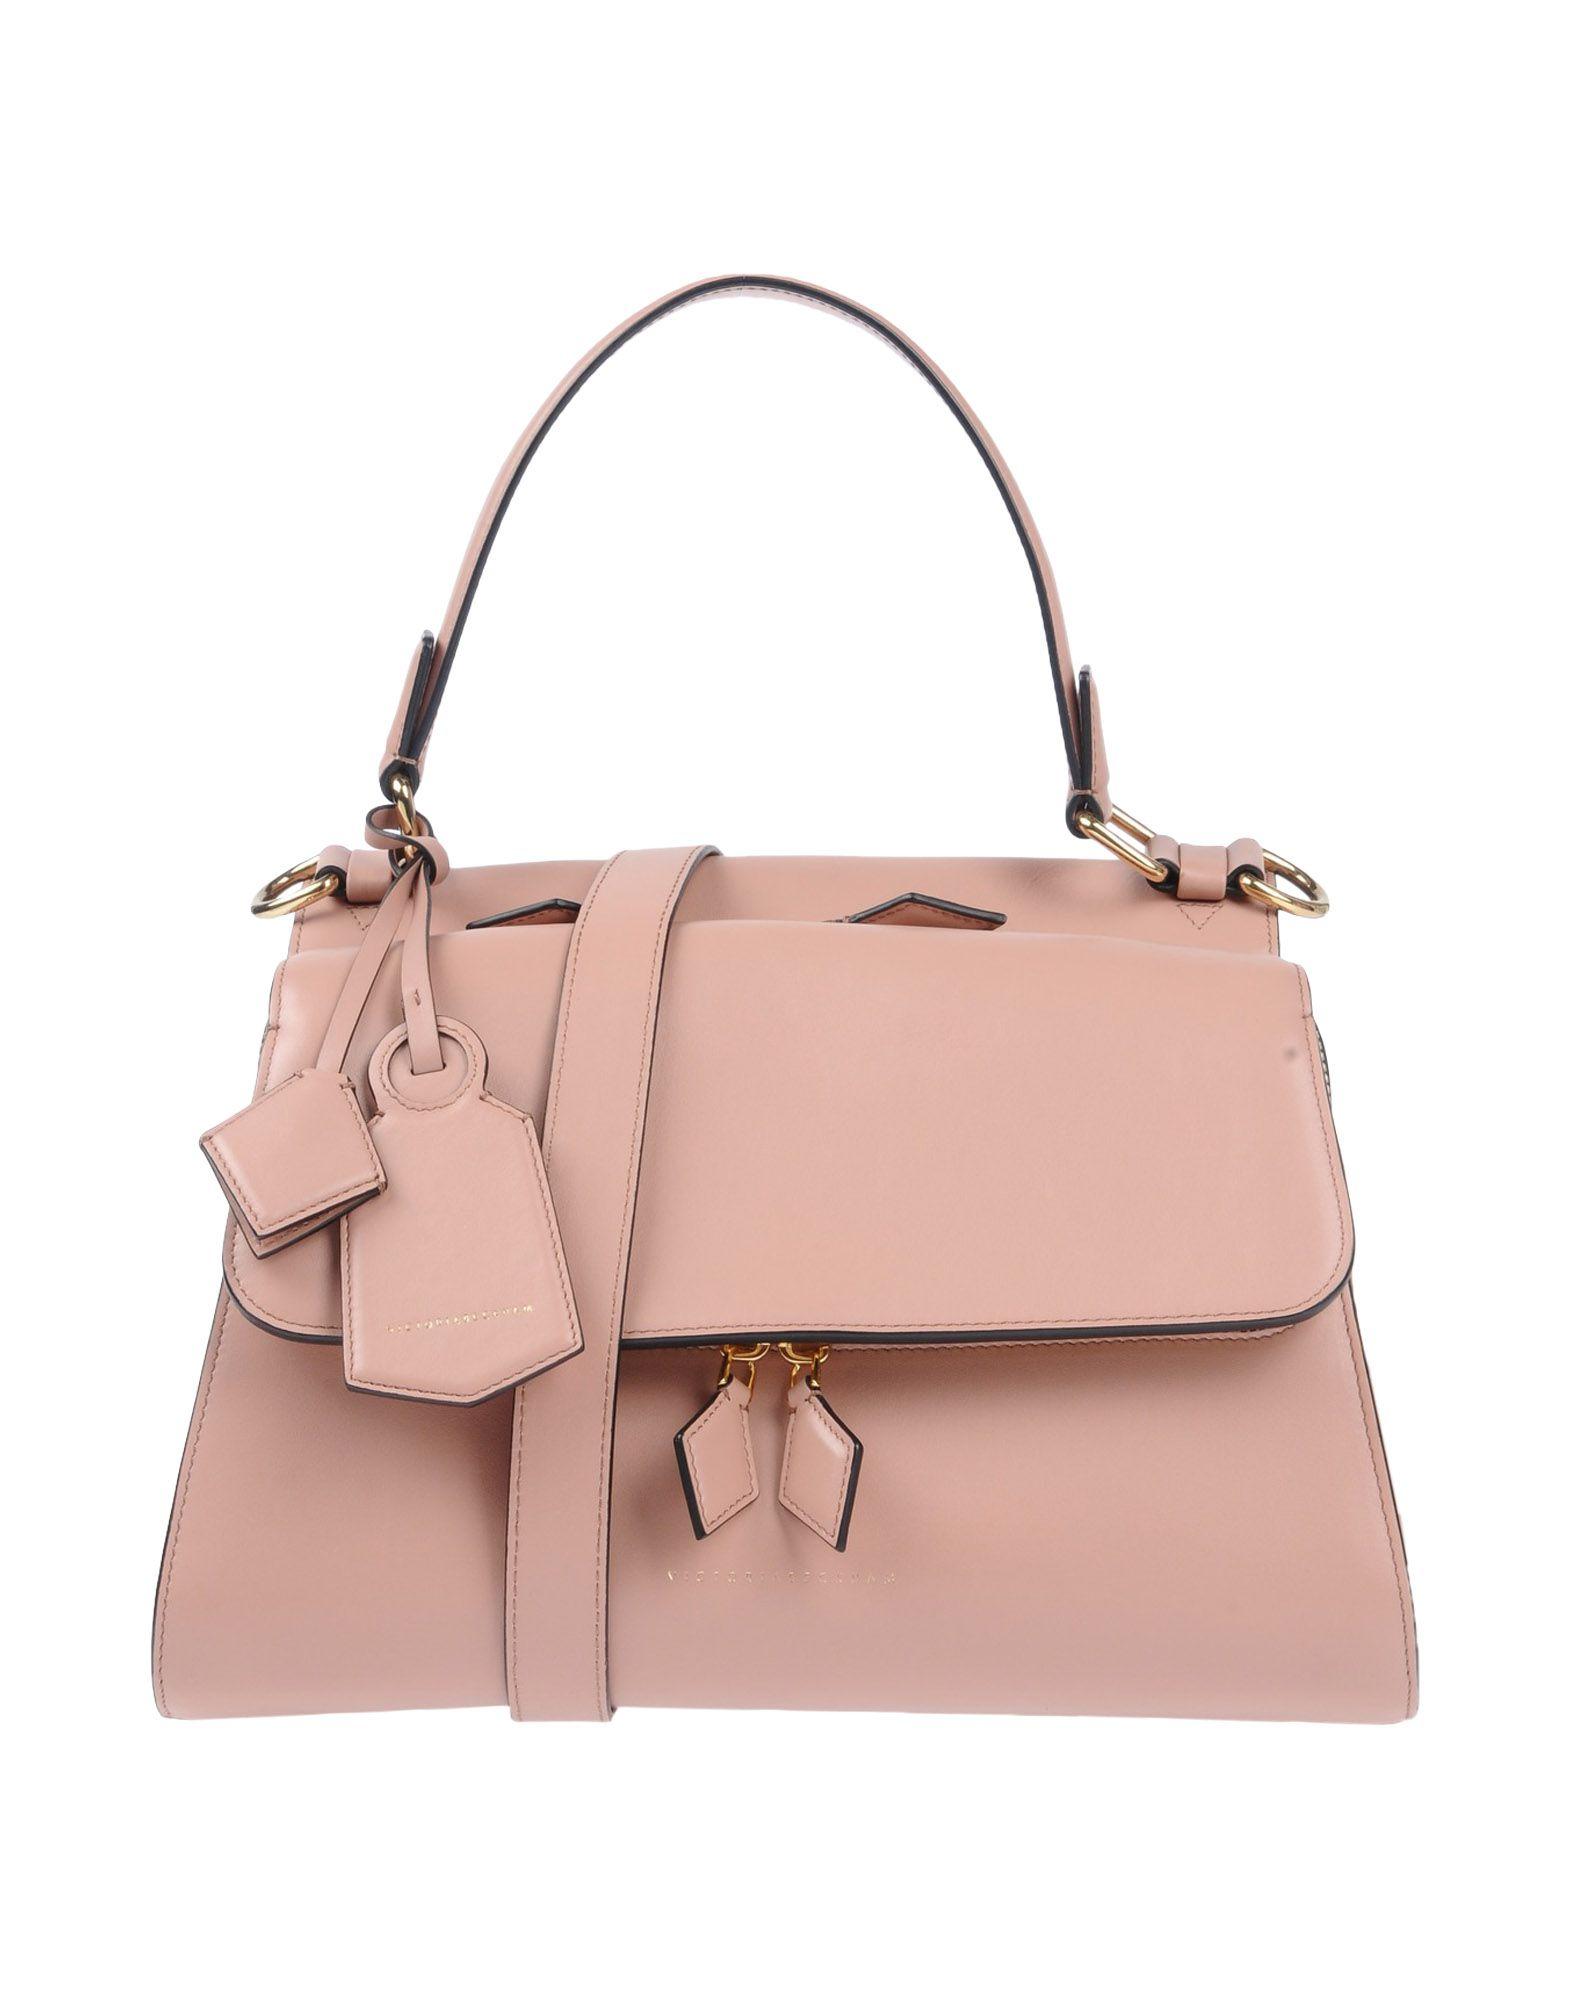 1ed6dc1a0 Victoria Beckham Handbag - Women Victoria Beckham Handbags online on ...